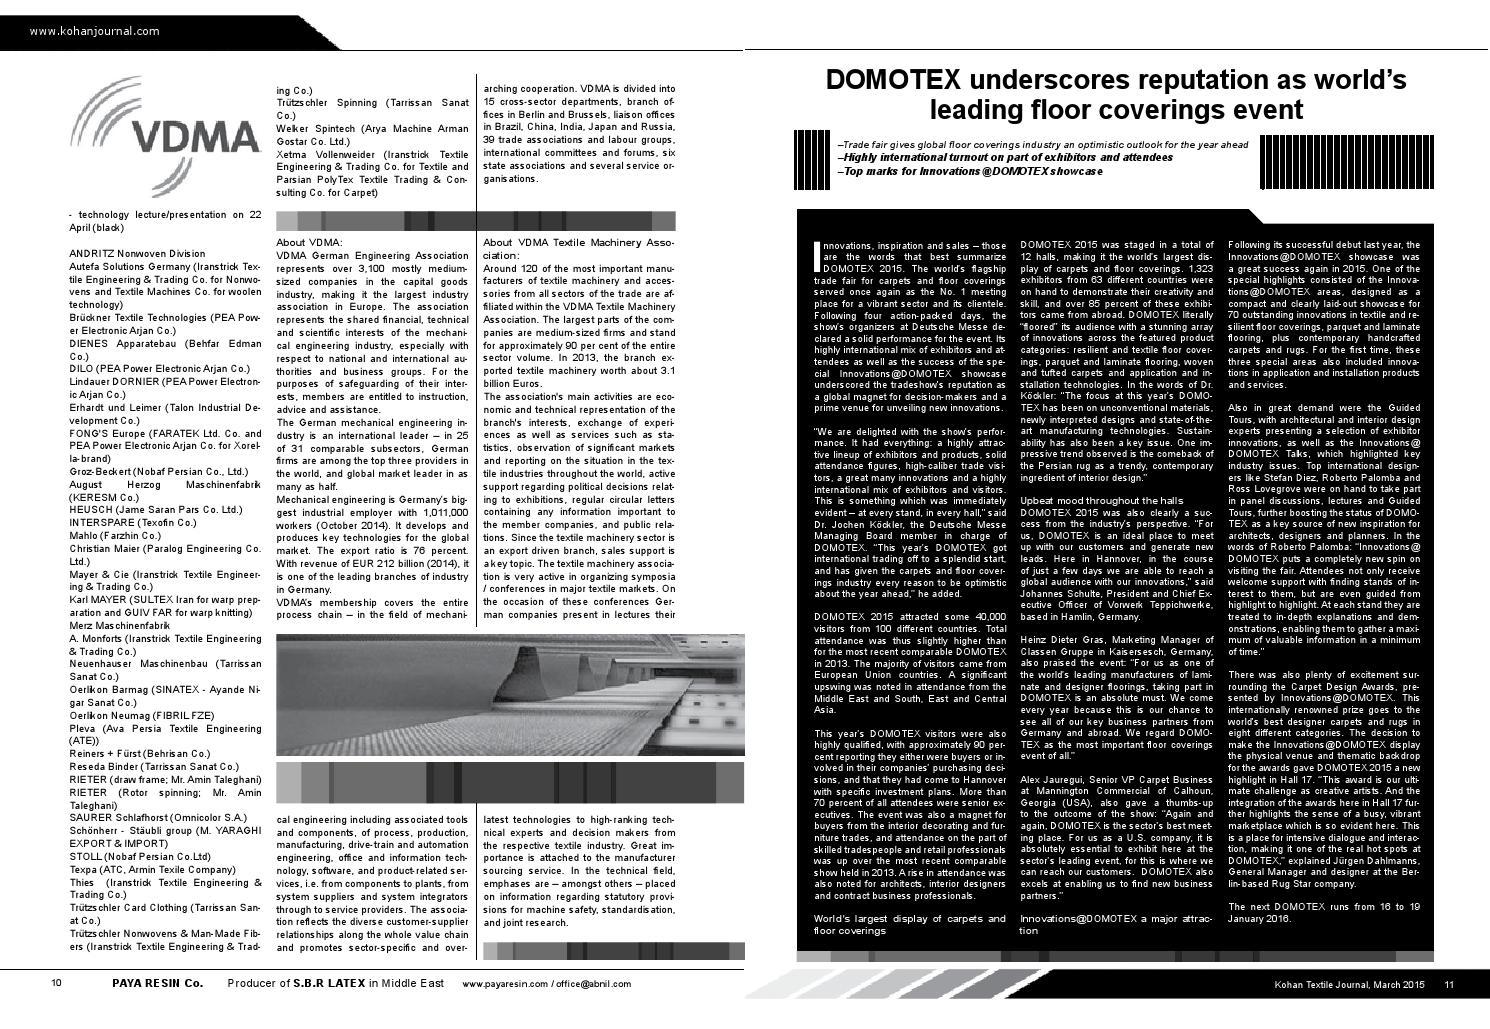 Kohan textile Journal No 28 by Kohan Textile Journal / Middle East